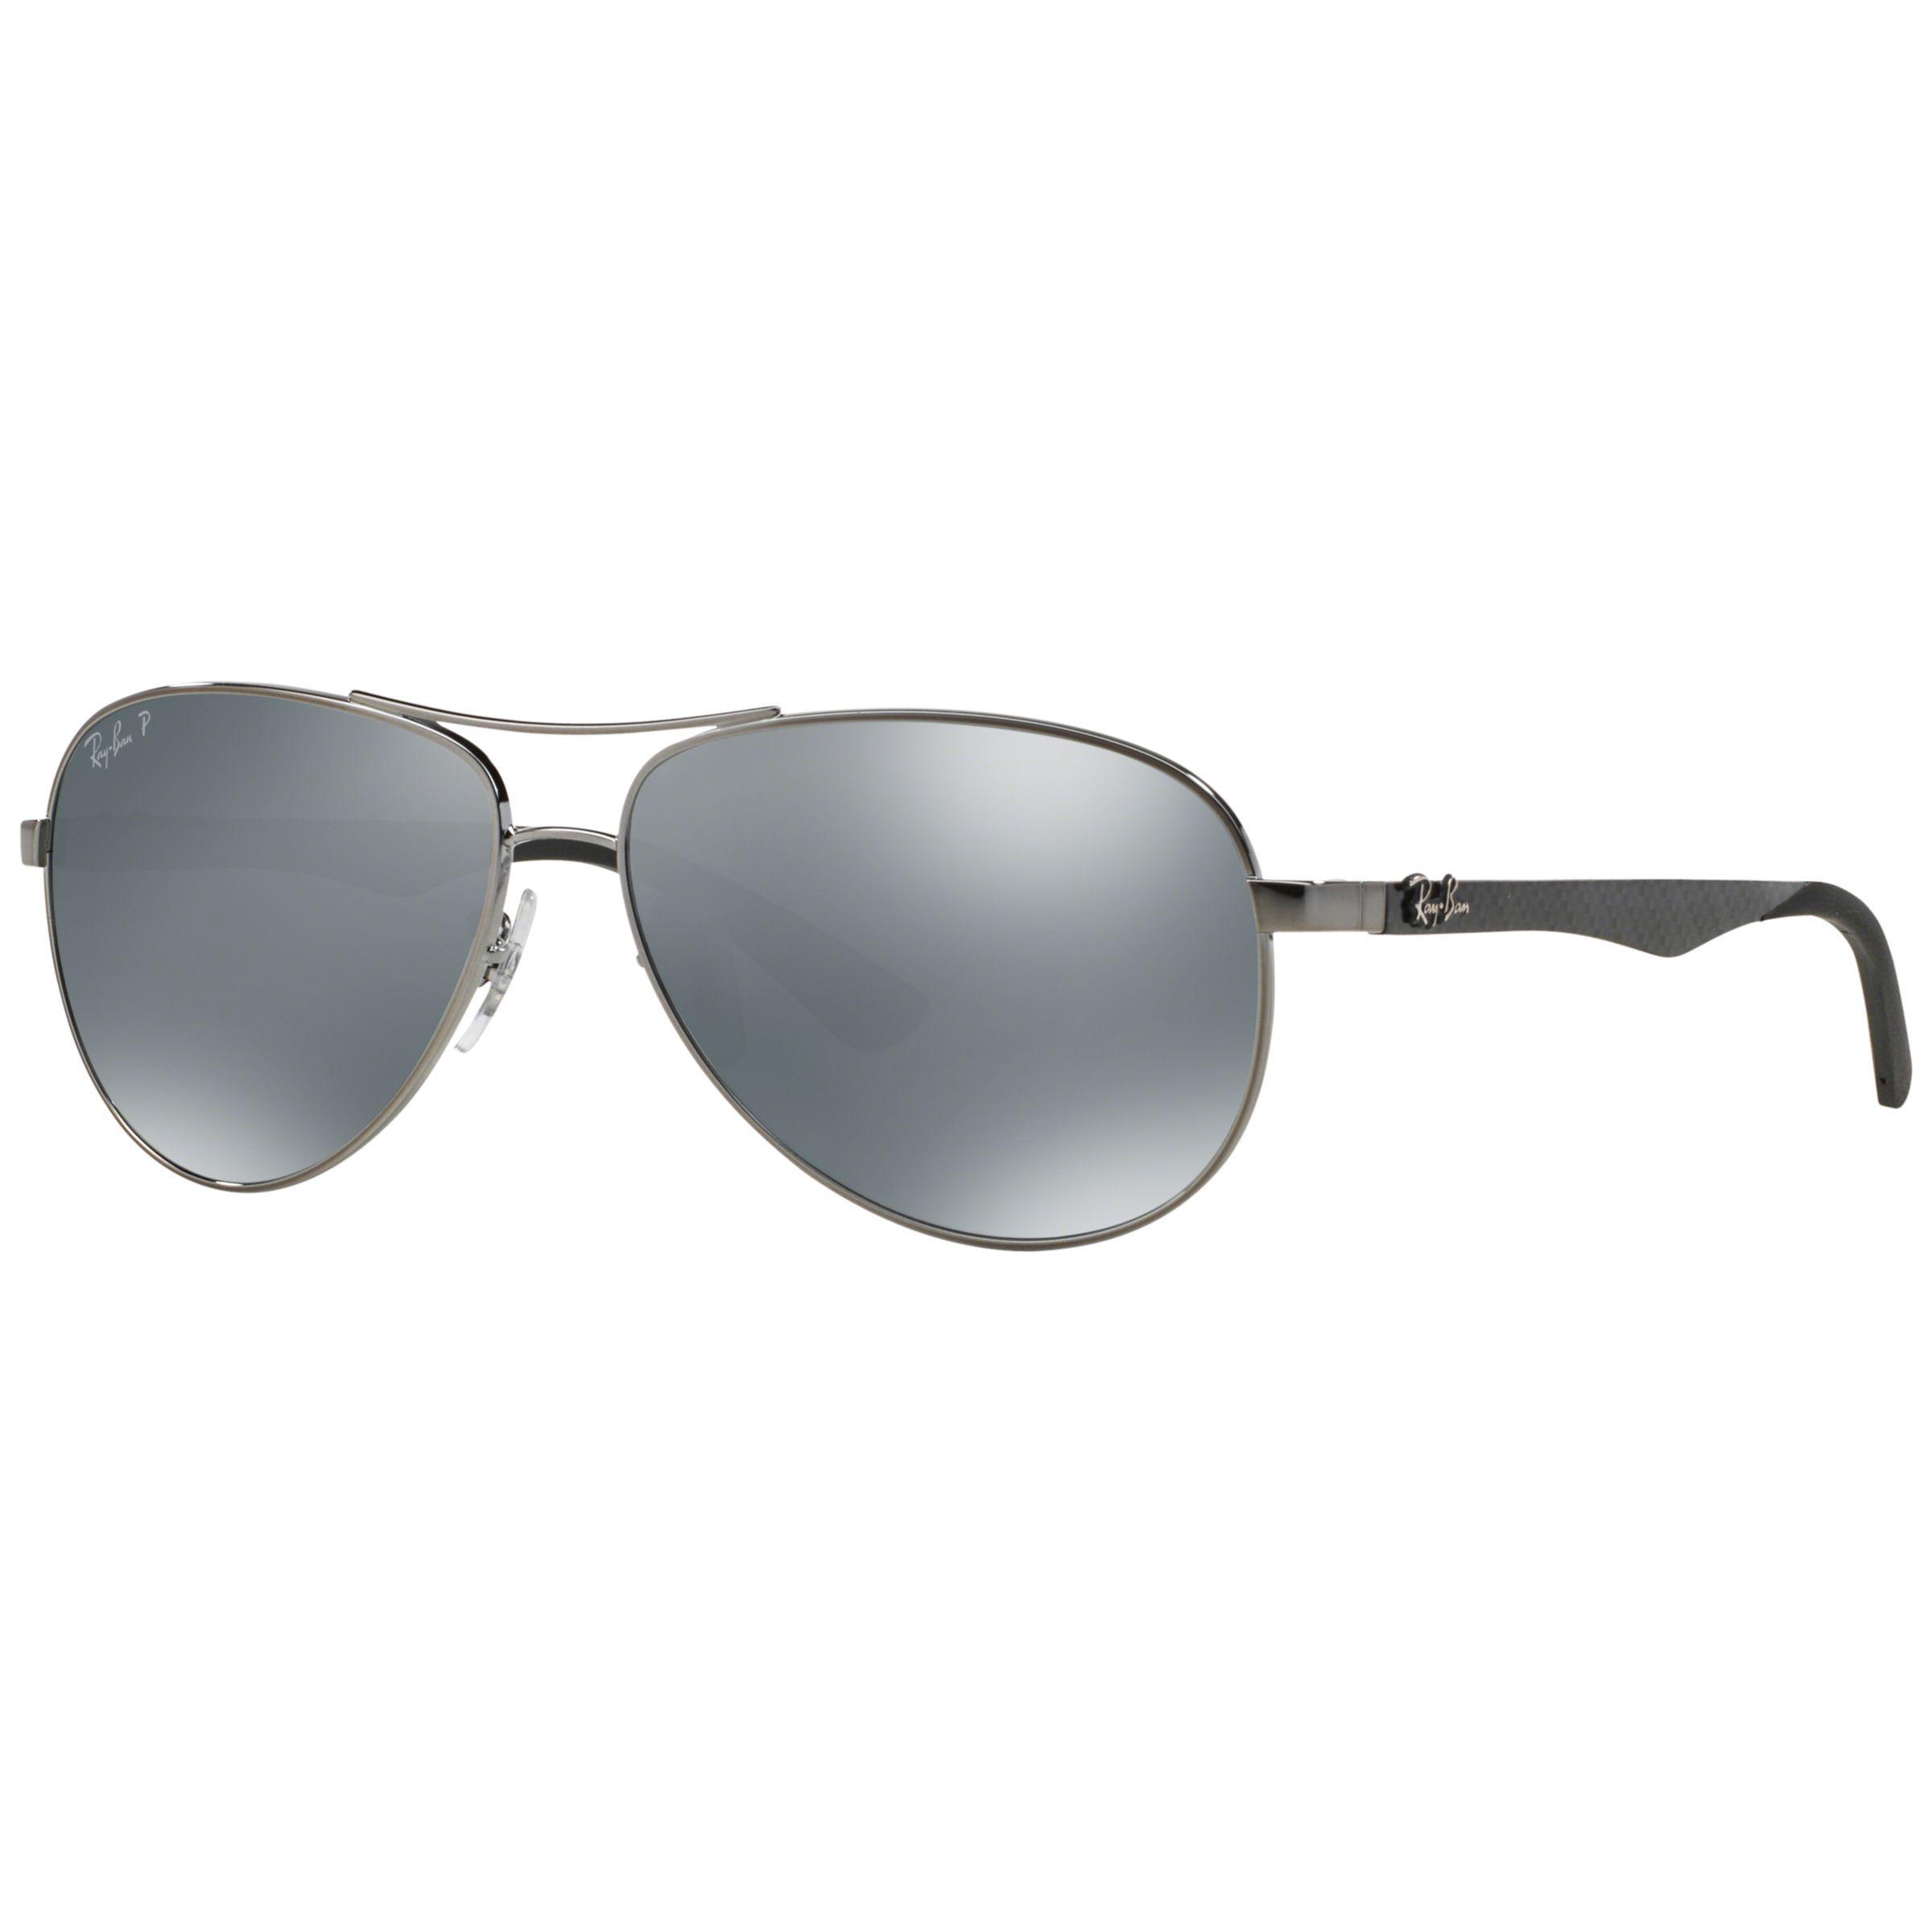 b3f298bdc7 Ray-Ban Rb8313 Polarised Pilot Sunglasses in Metallic for Men - Lyst